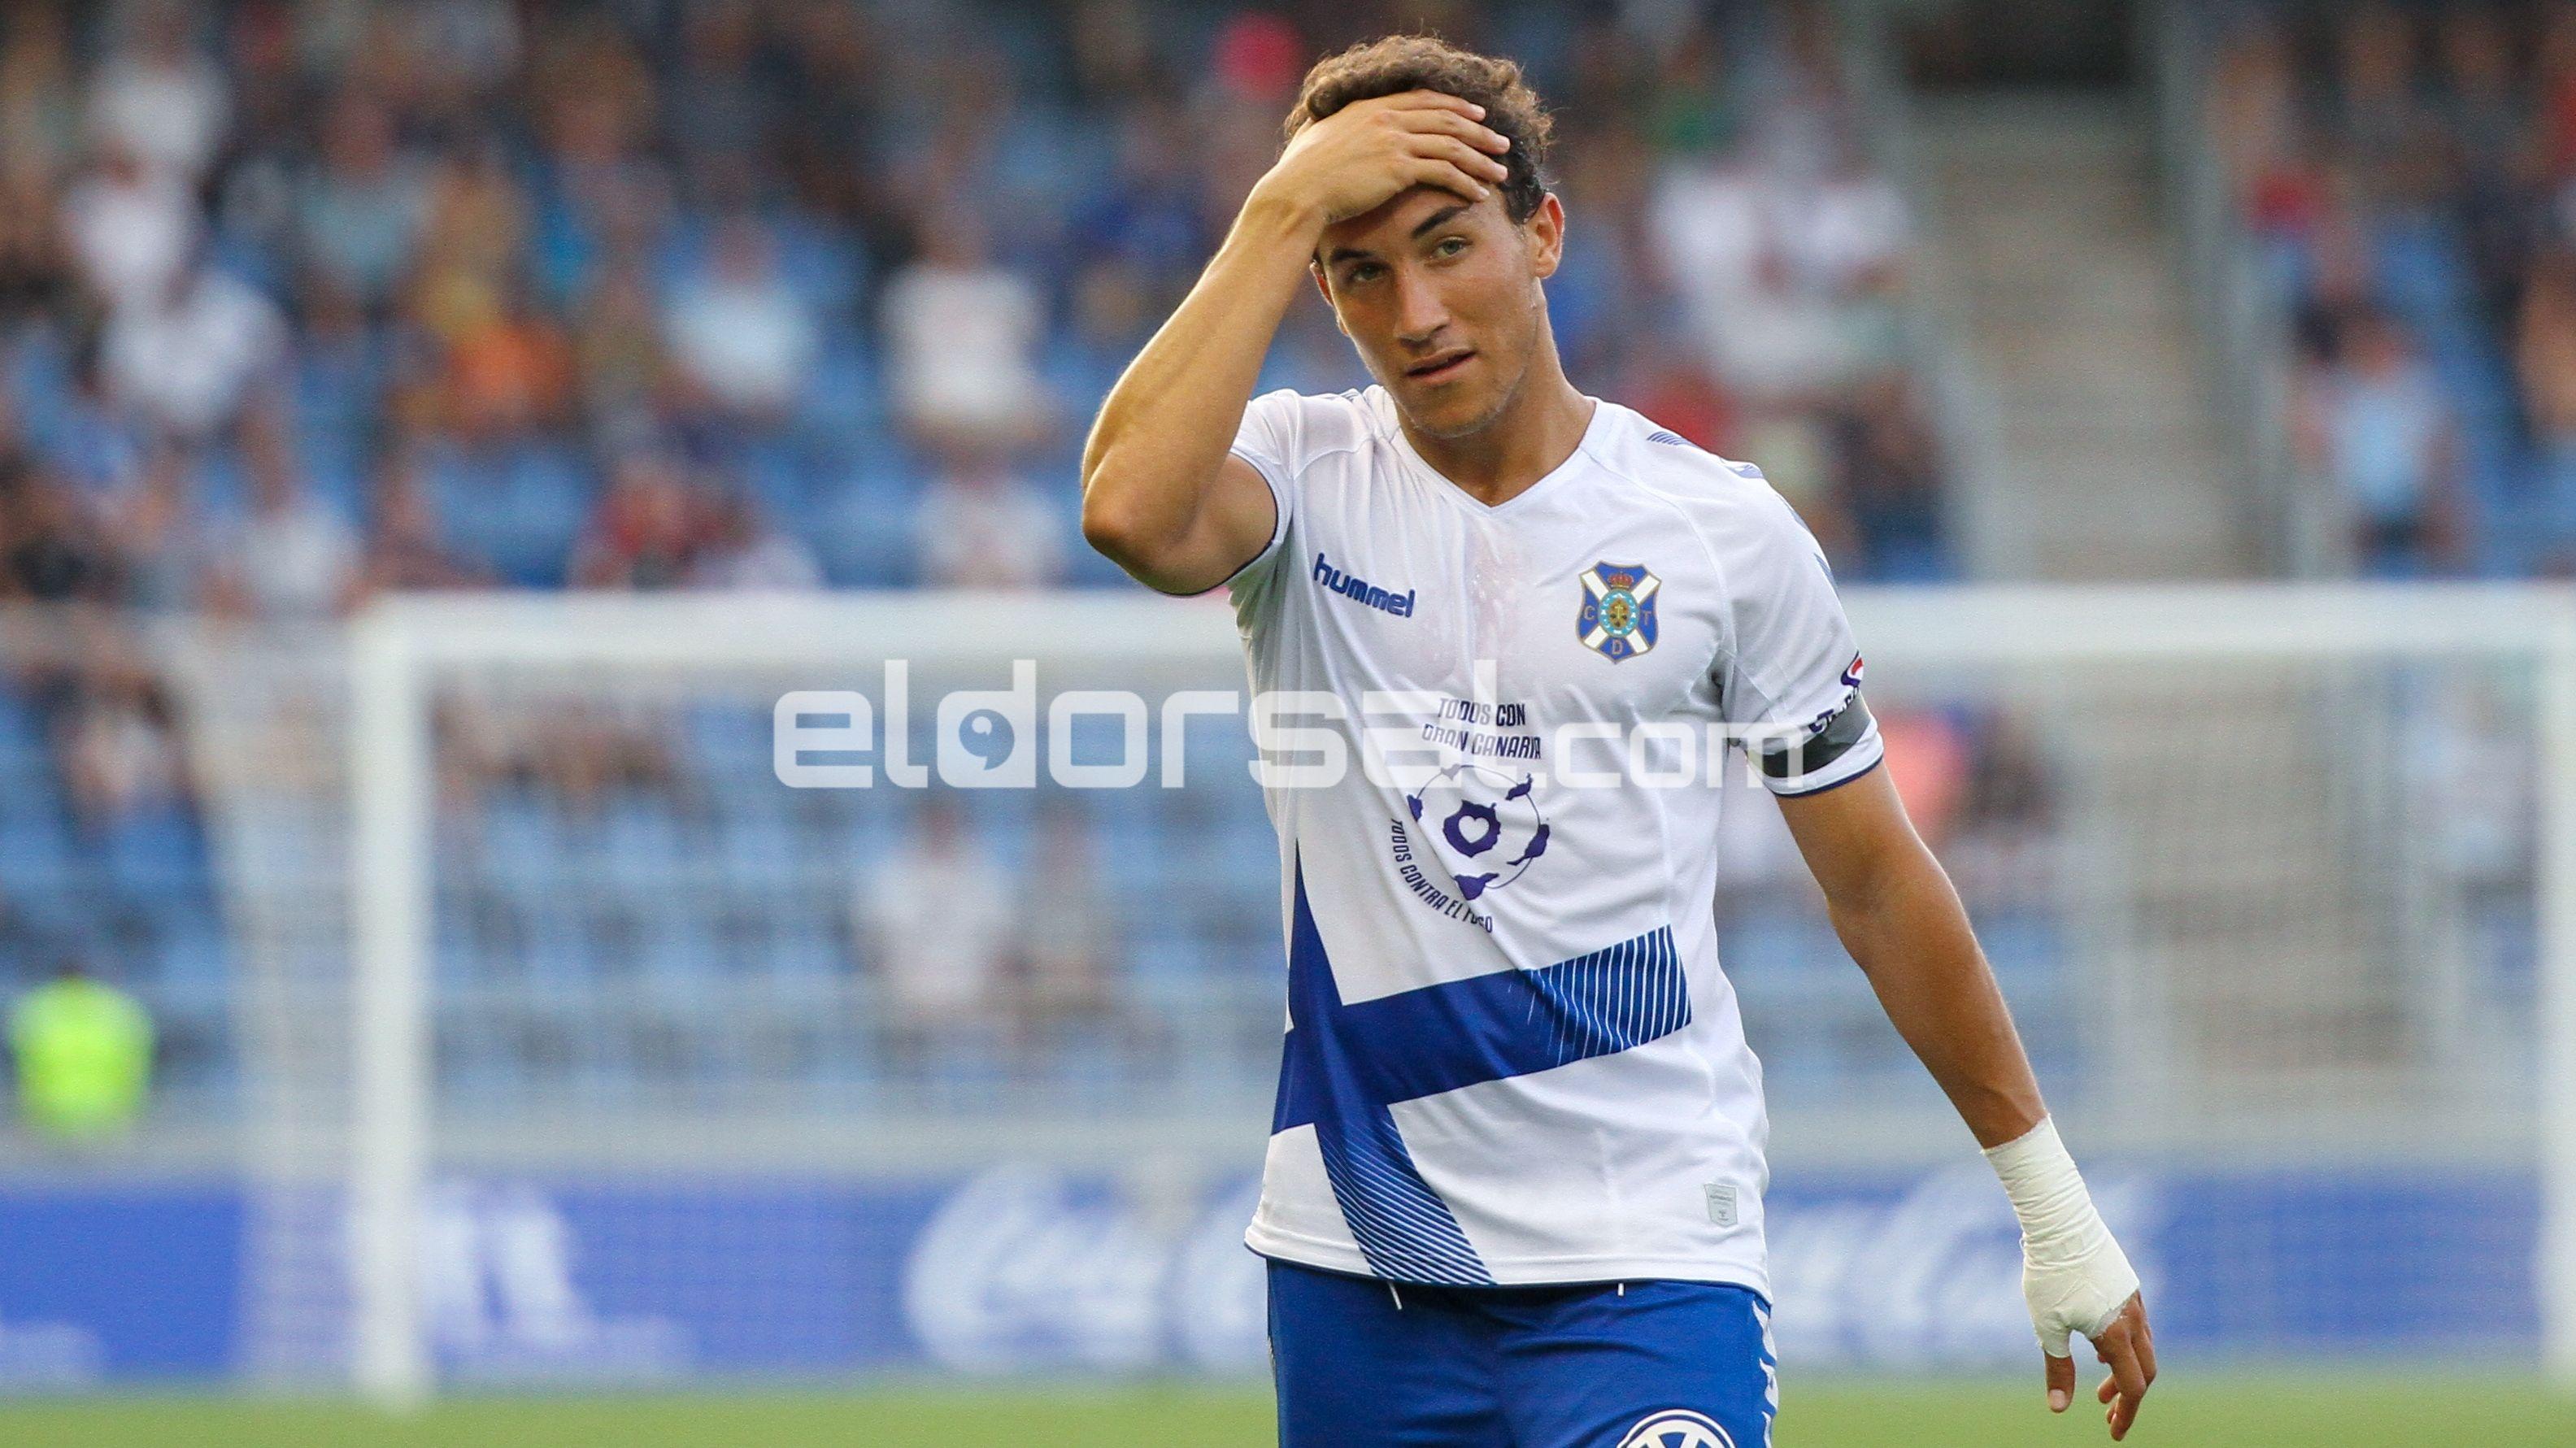 Luis MIlla CD Tenerife lamento